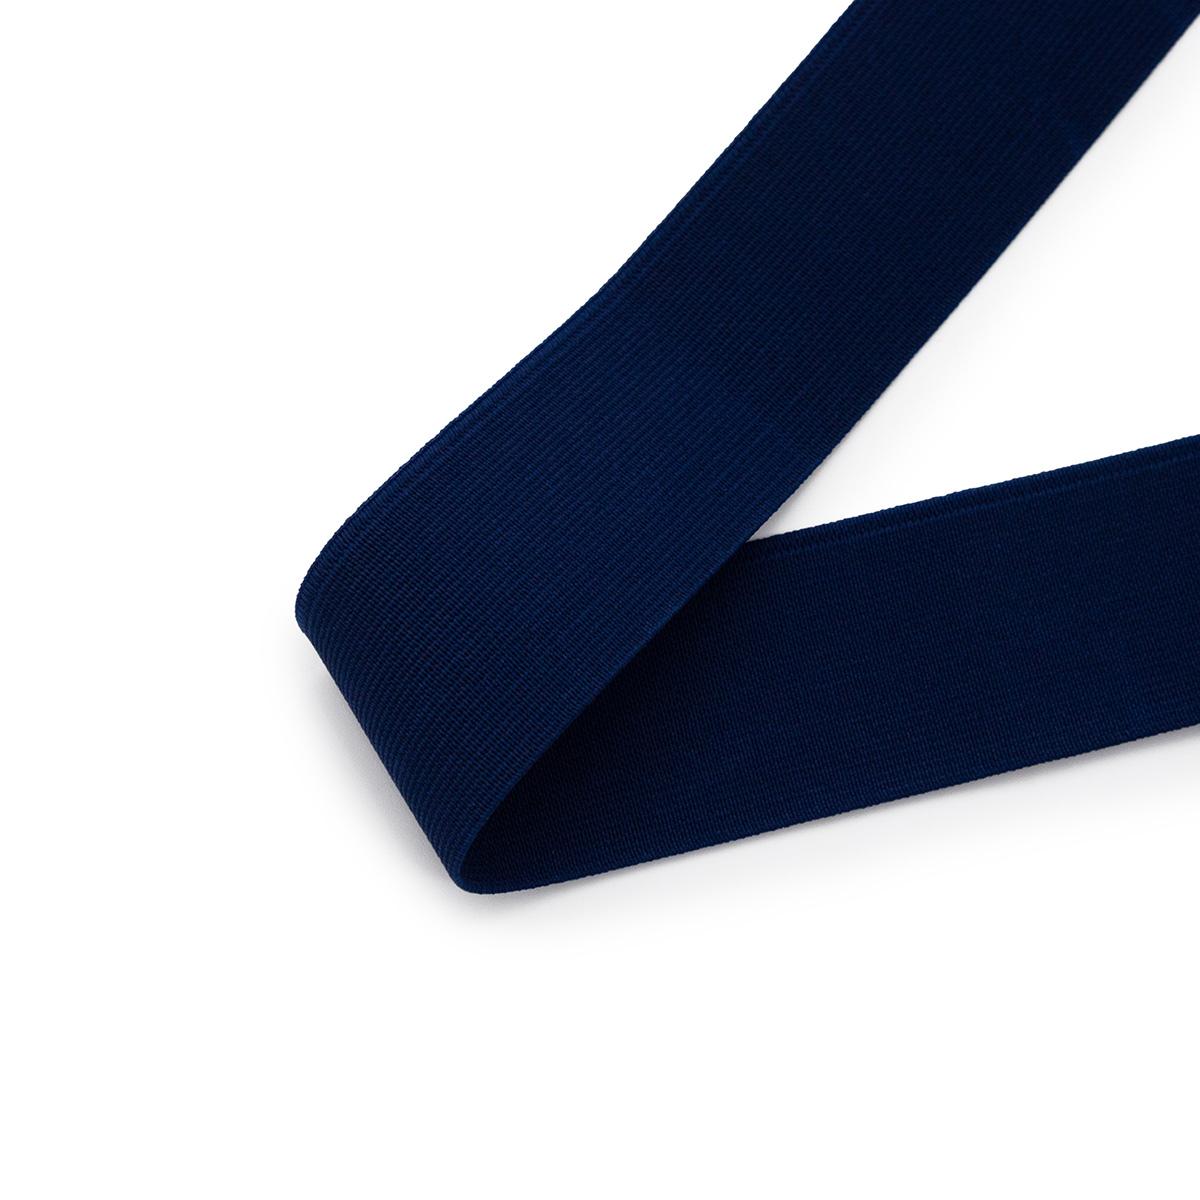 15-3850/9882 Резинка вязаная 40мм*25м т.синий